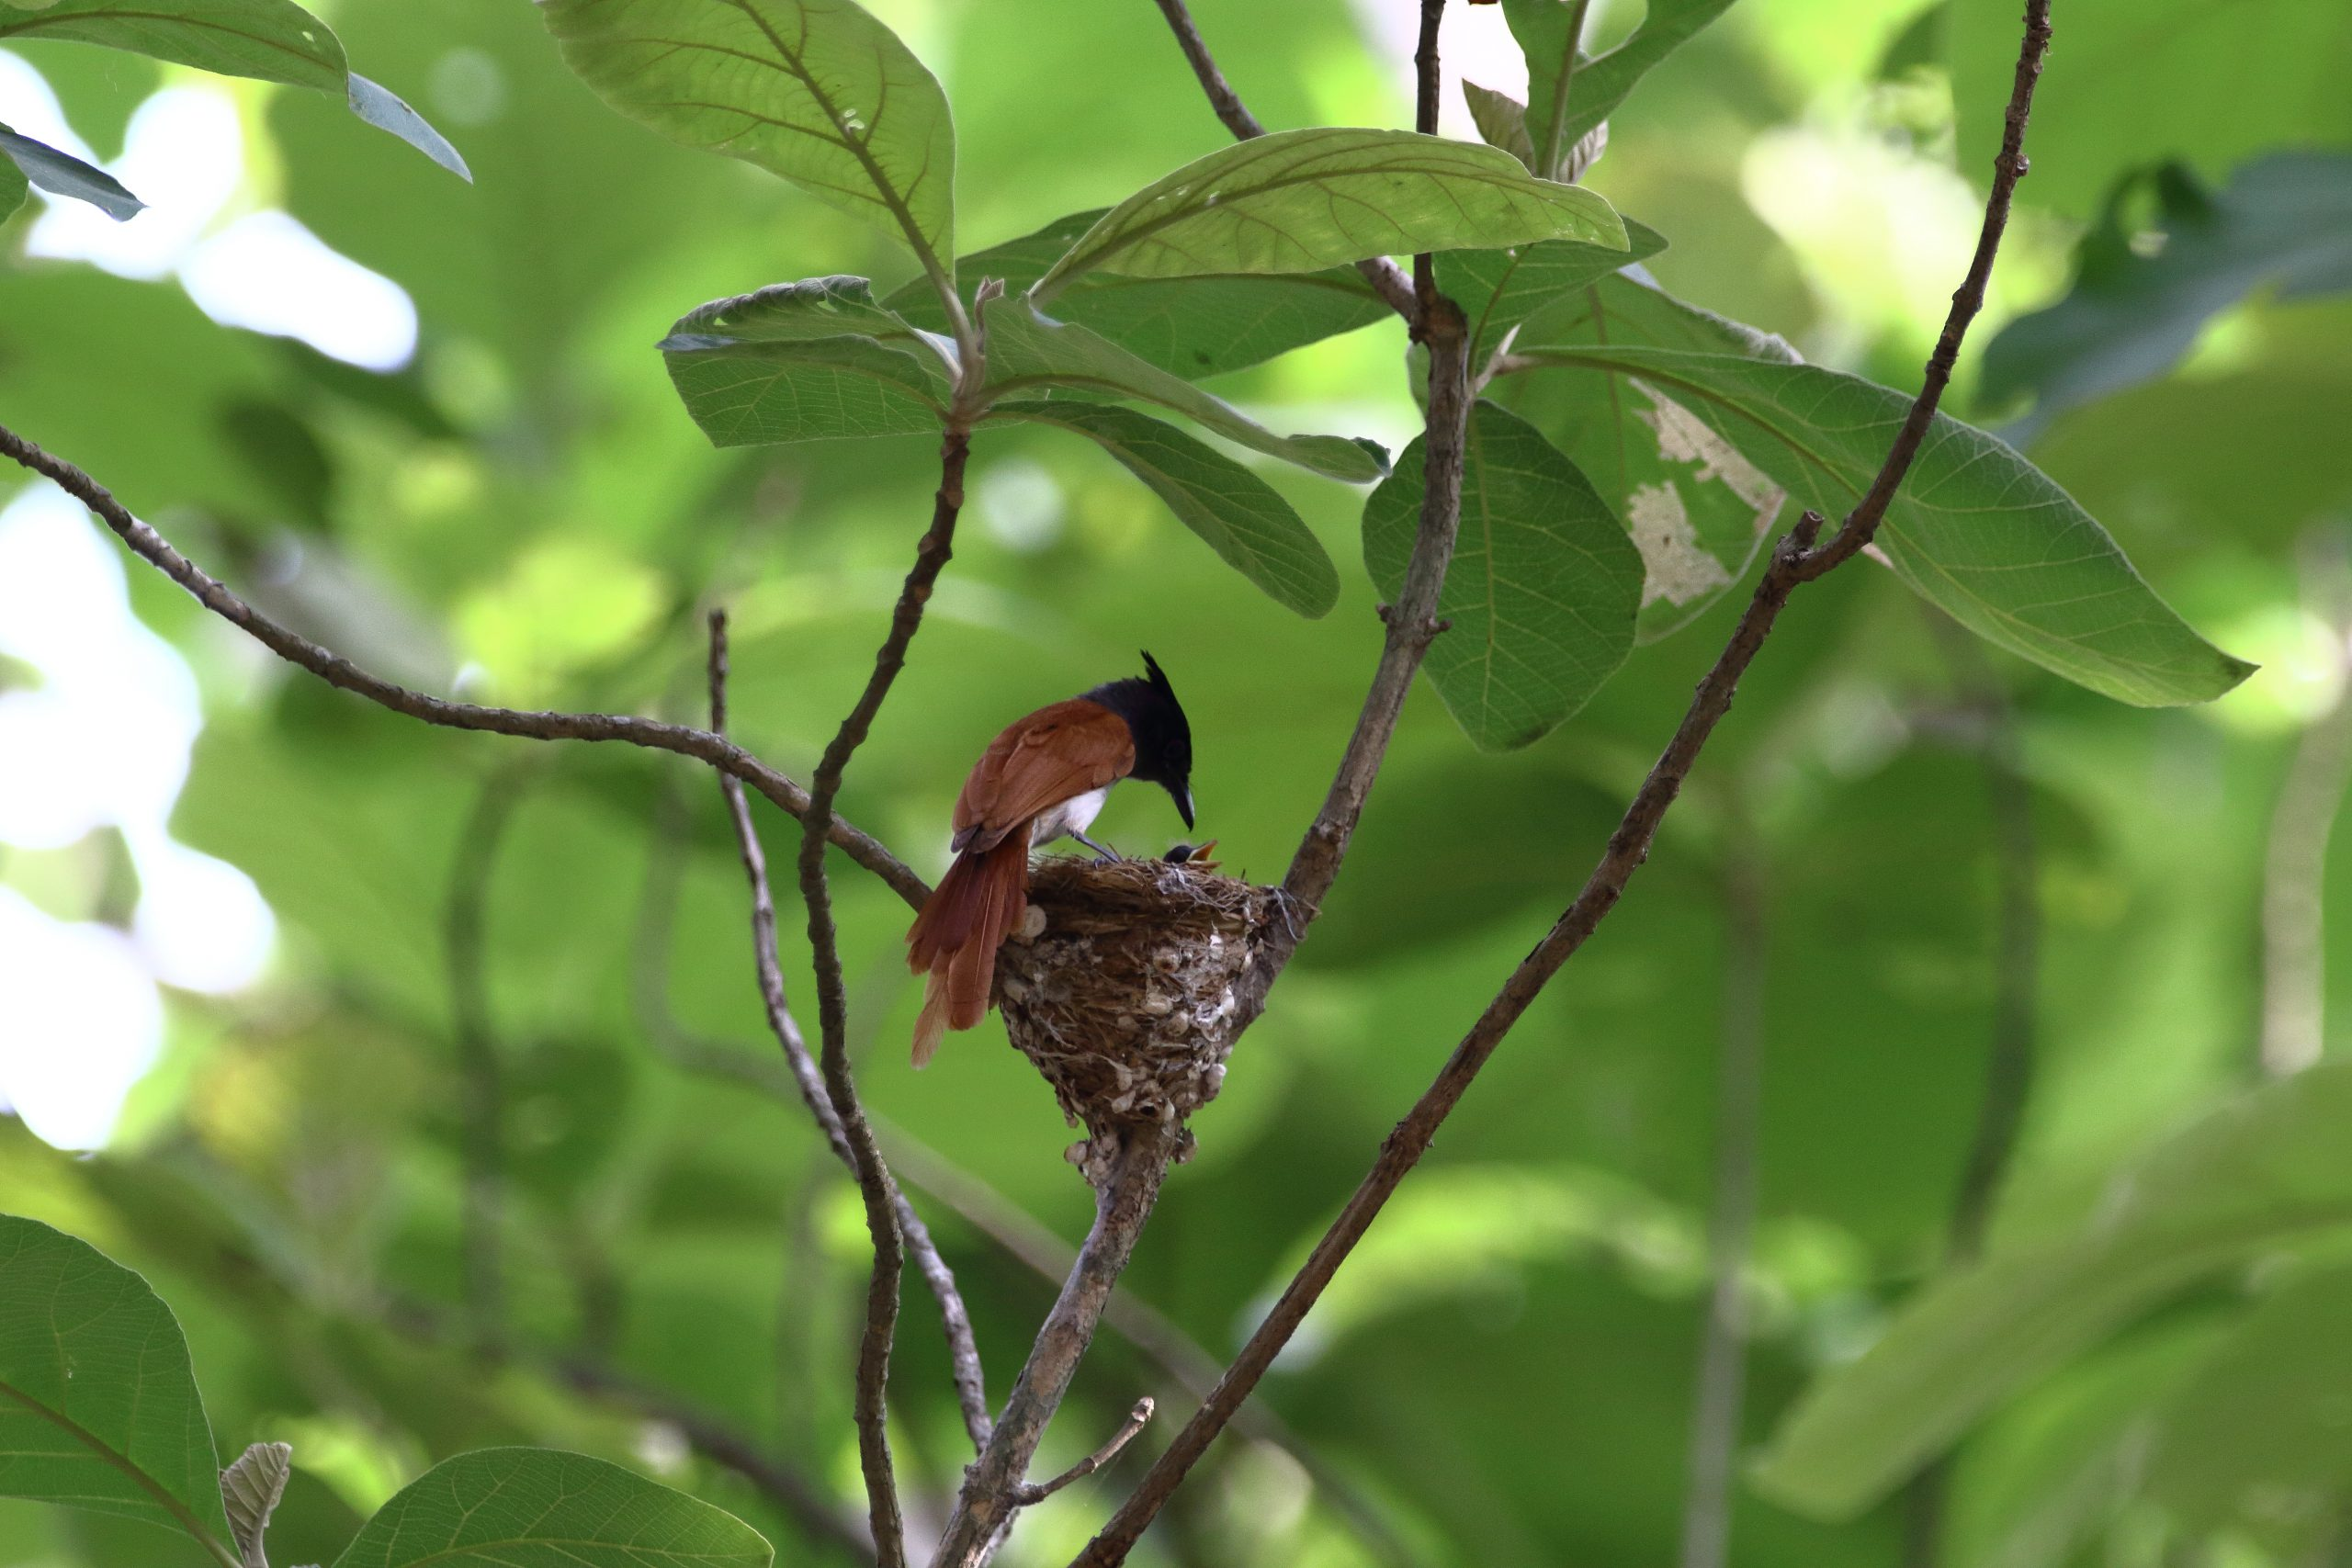 Nest of a bird on a branch